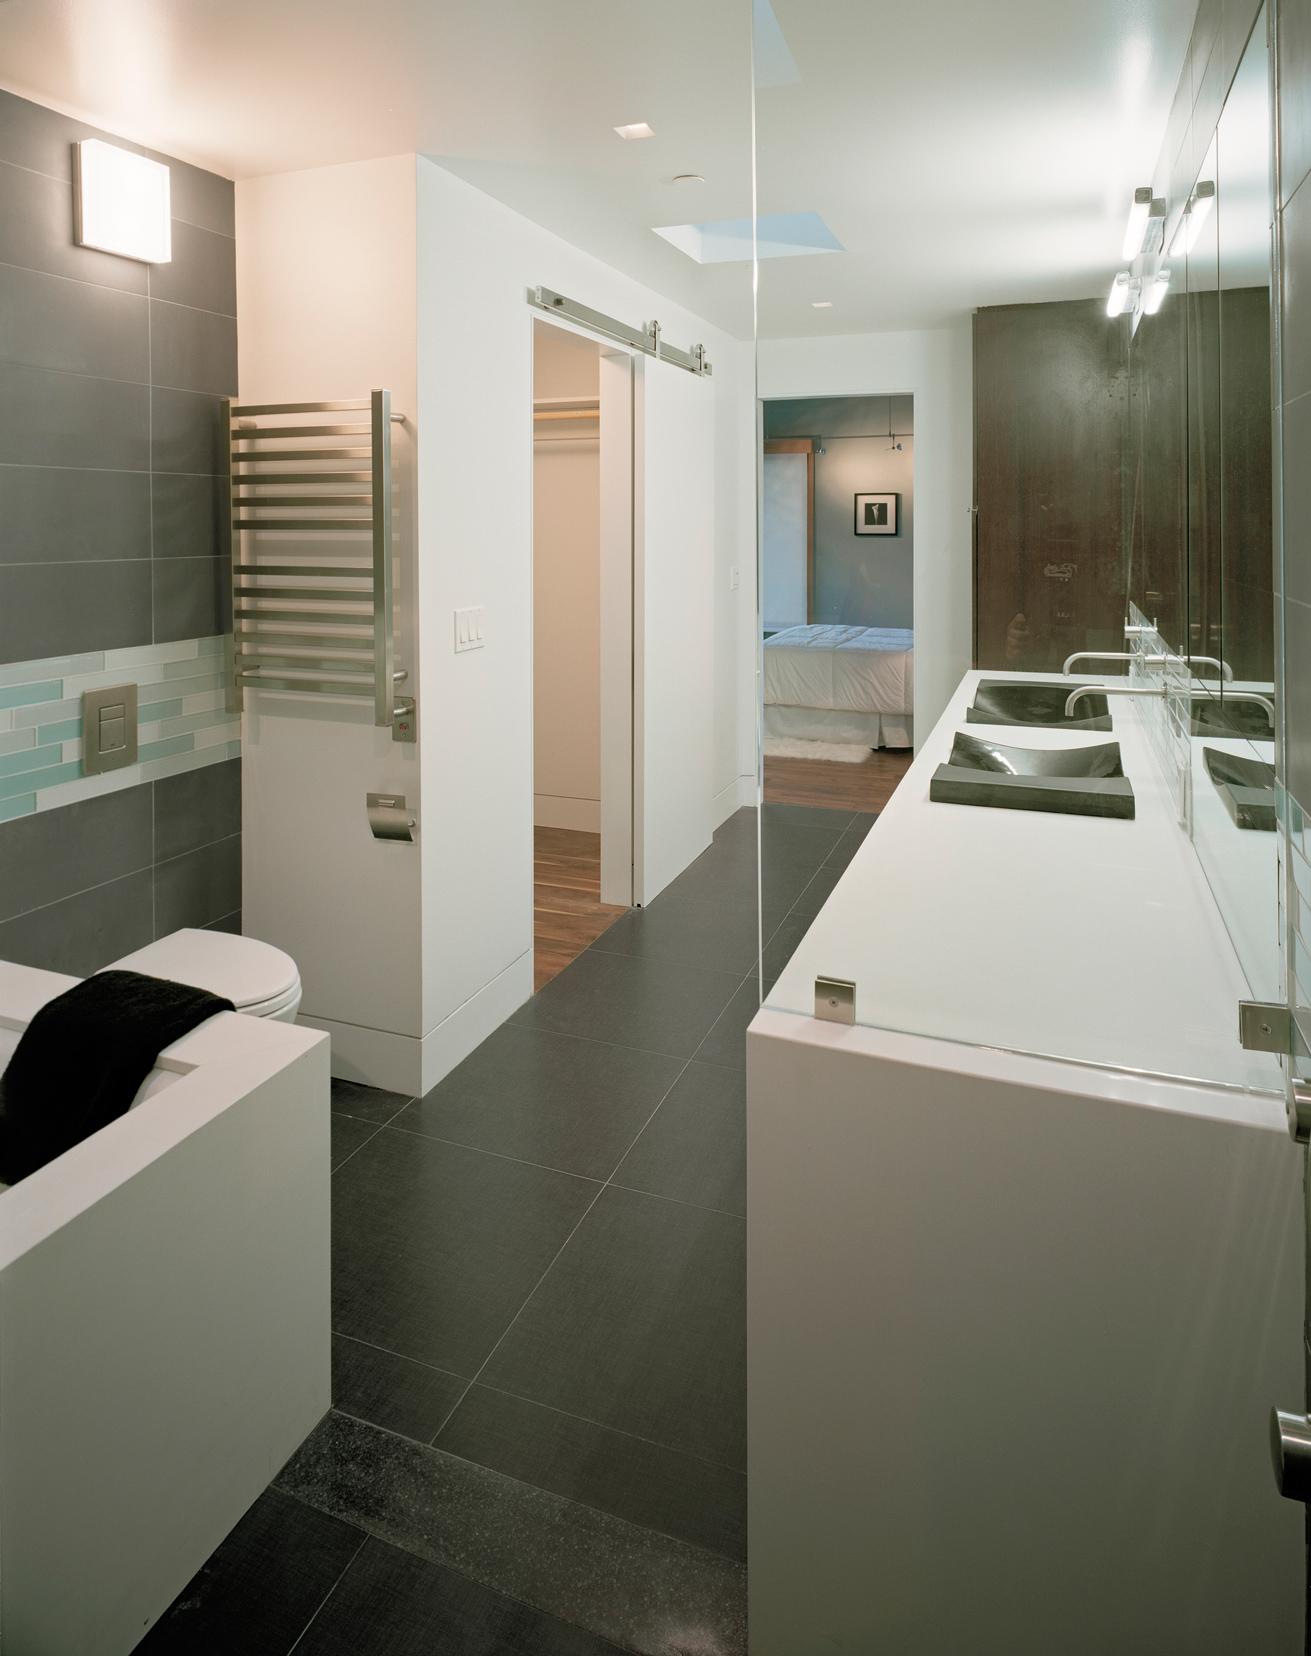 Master-bath-in-new-modern-home.jpg